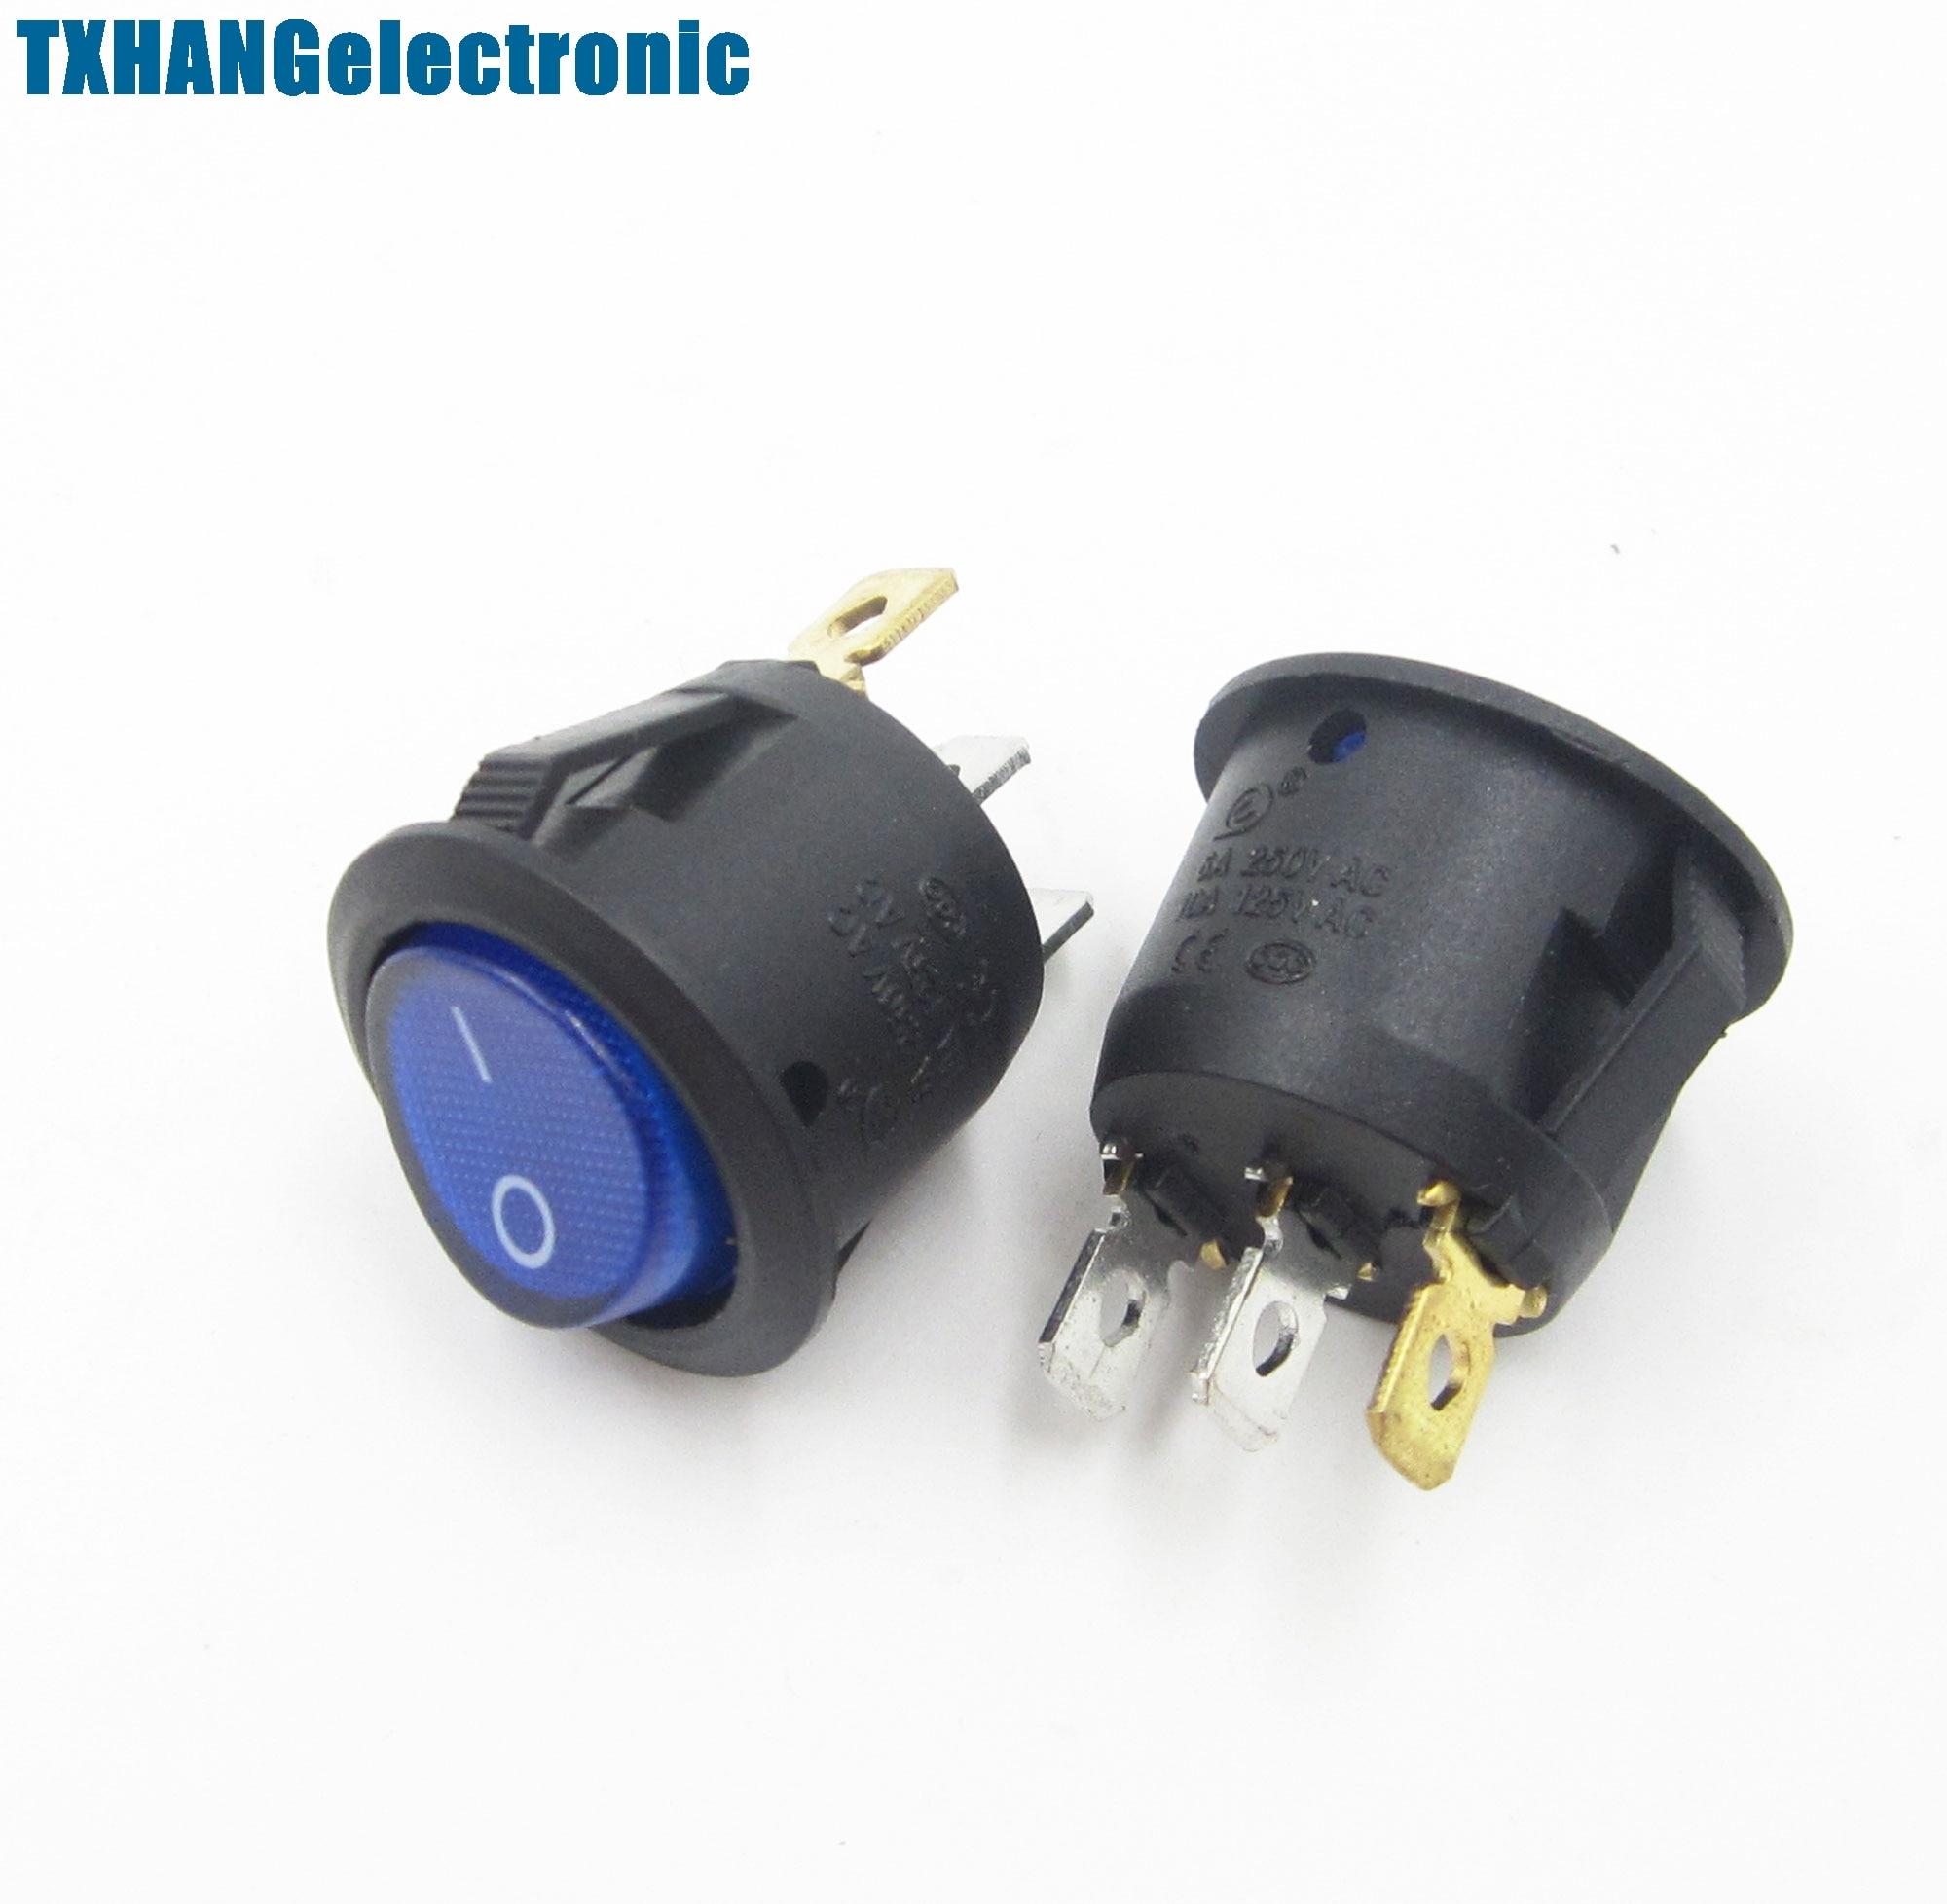 5 uds Mini 3 Pin redondo SPDT en-interruptor basculante Snap-en azul